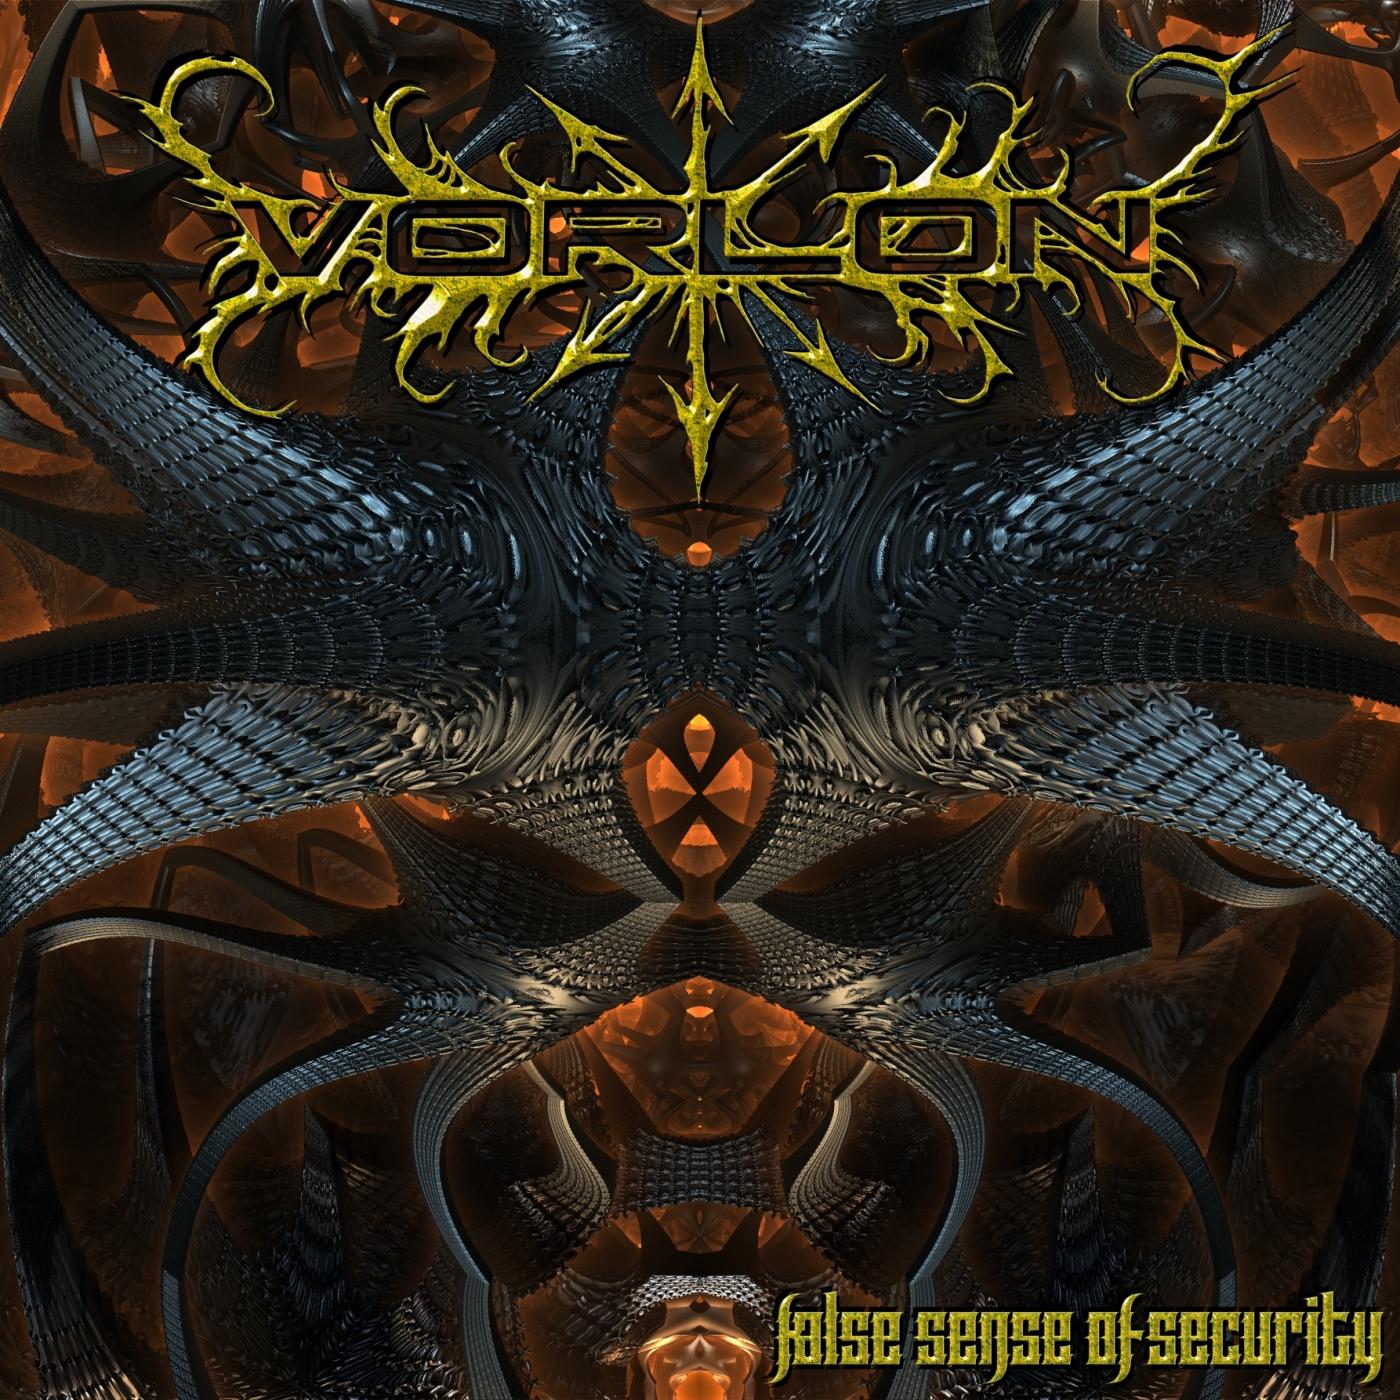 Vorlon - False Sense of Security cover